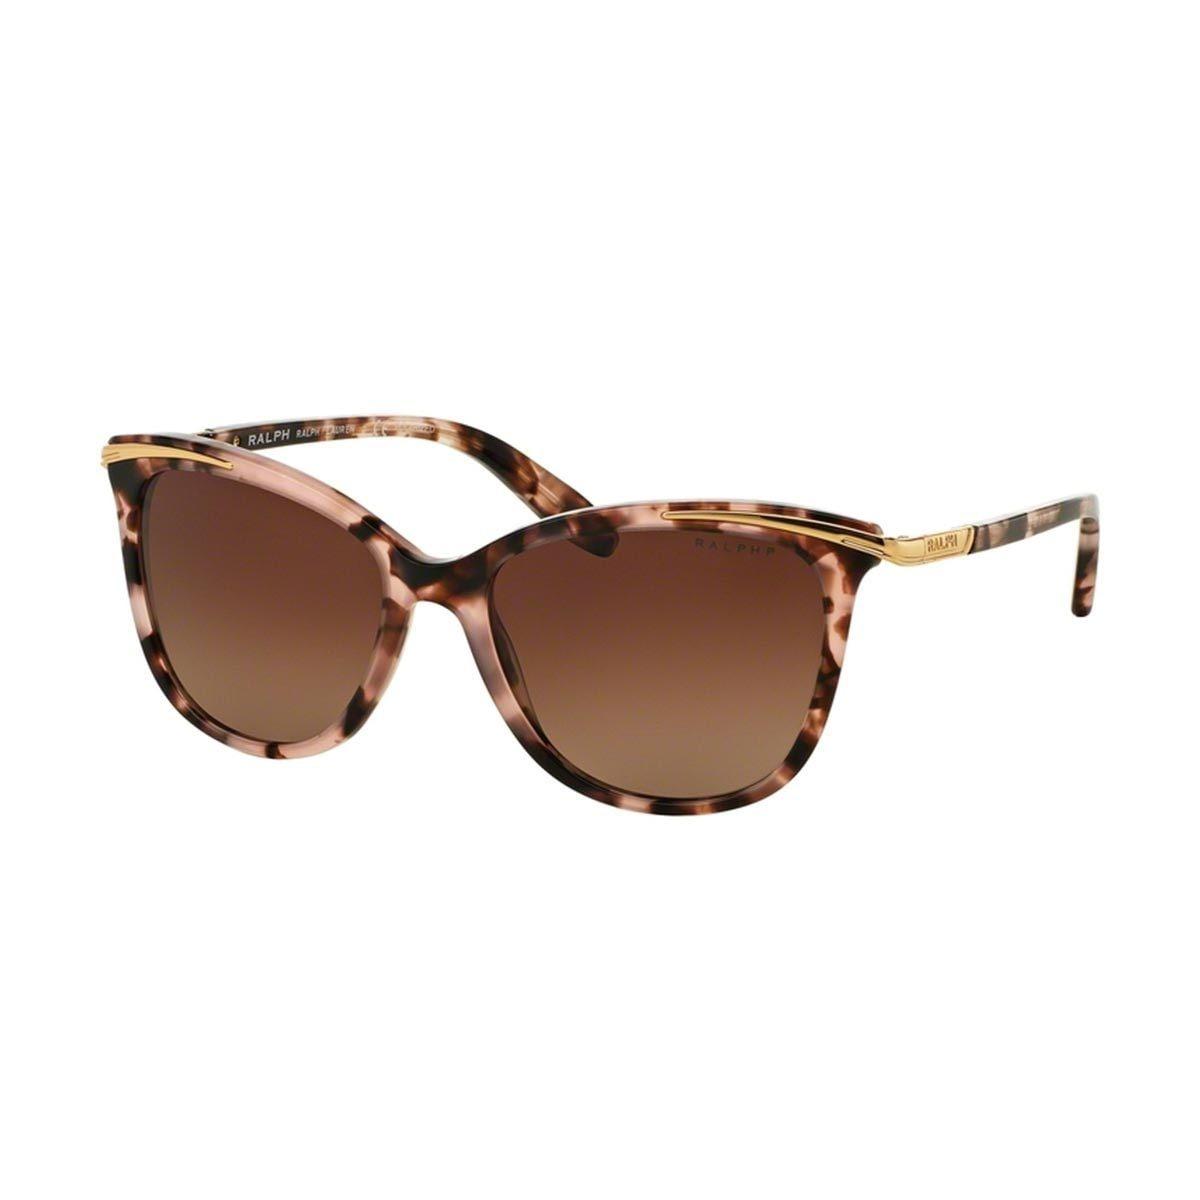 d8f138dbb2 Shop Ralph Lauren RA 5203 1090T5 Women s Black Tan Brown Polarized  54-16-135 mm Sunglasses by Ralph Lauren - Free Shipping Today - Overstock -  10857363